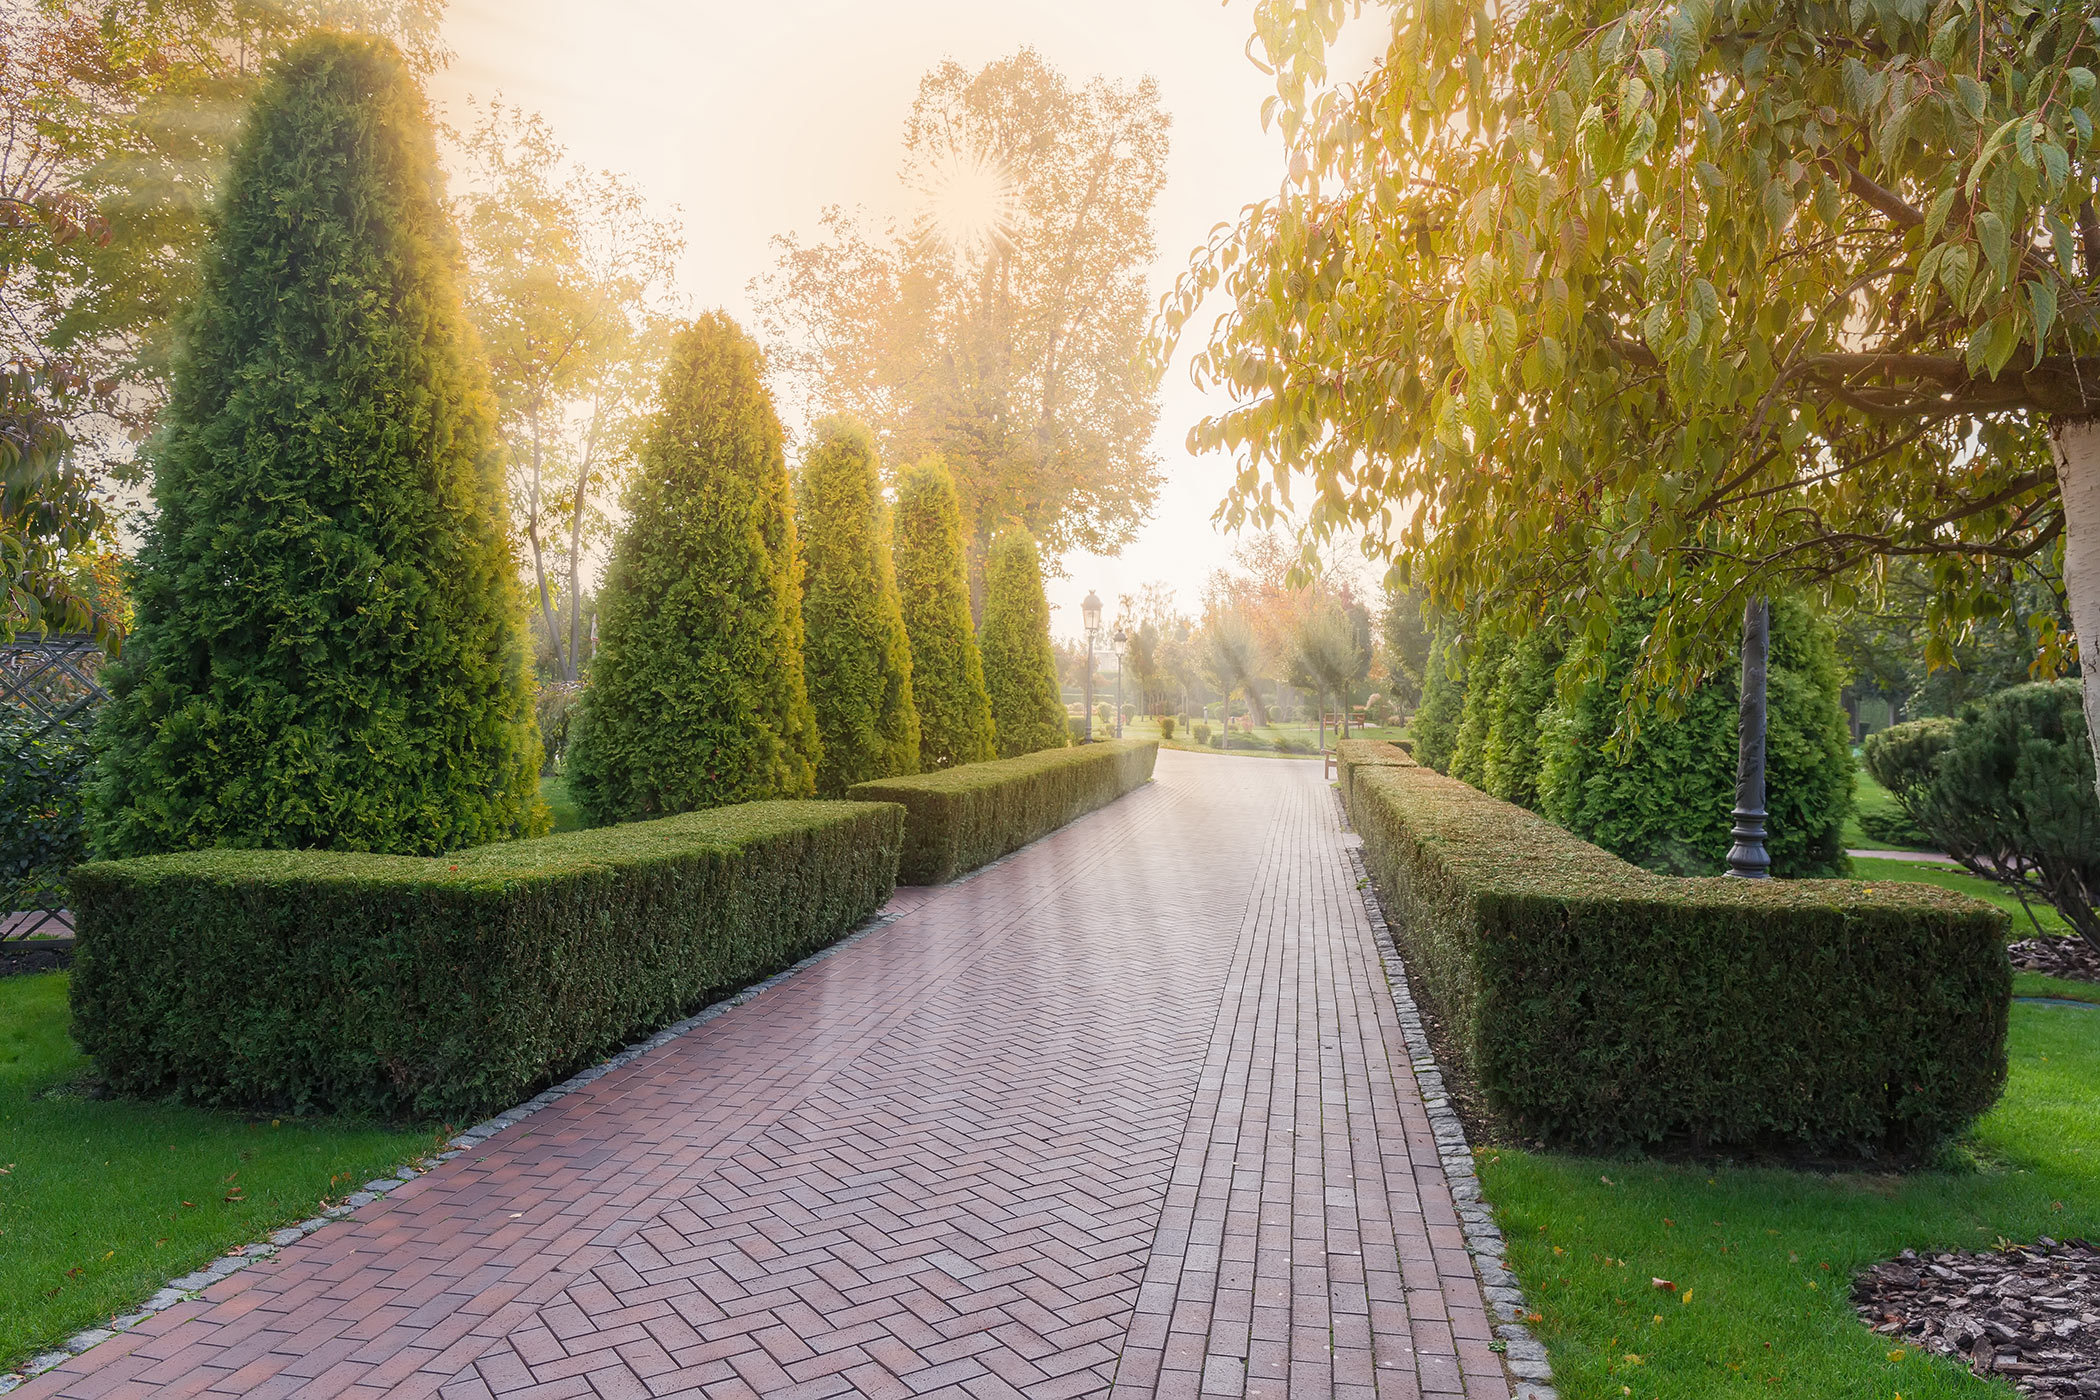 shrubs lining a paver walkway